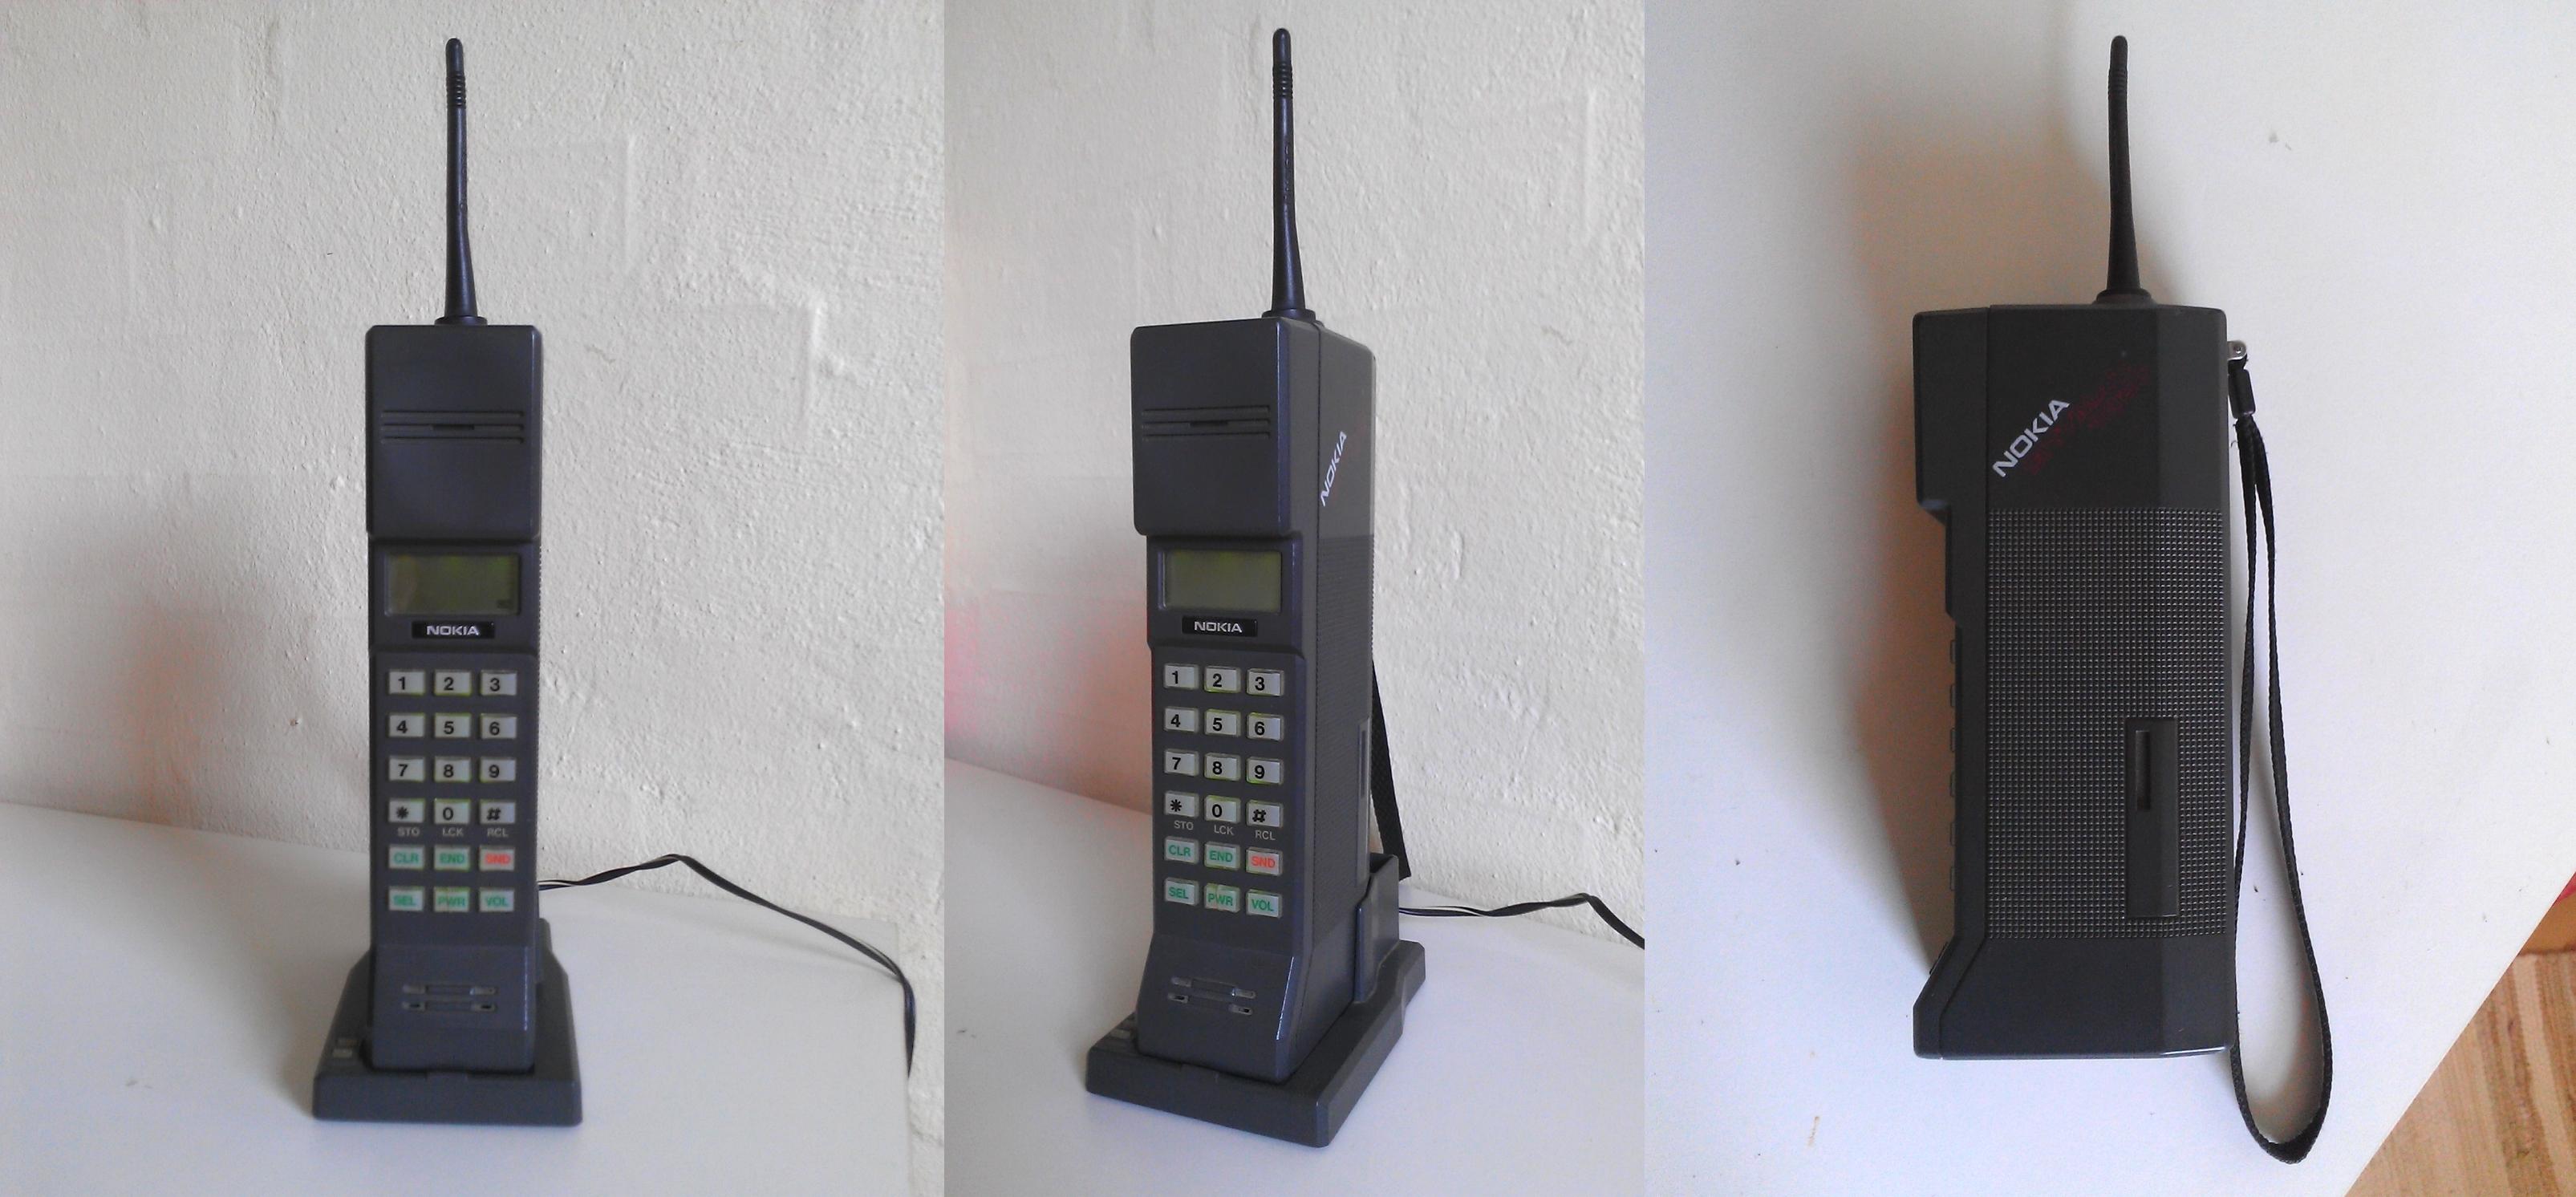 Nokia phones history in images (2018 update)